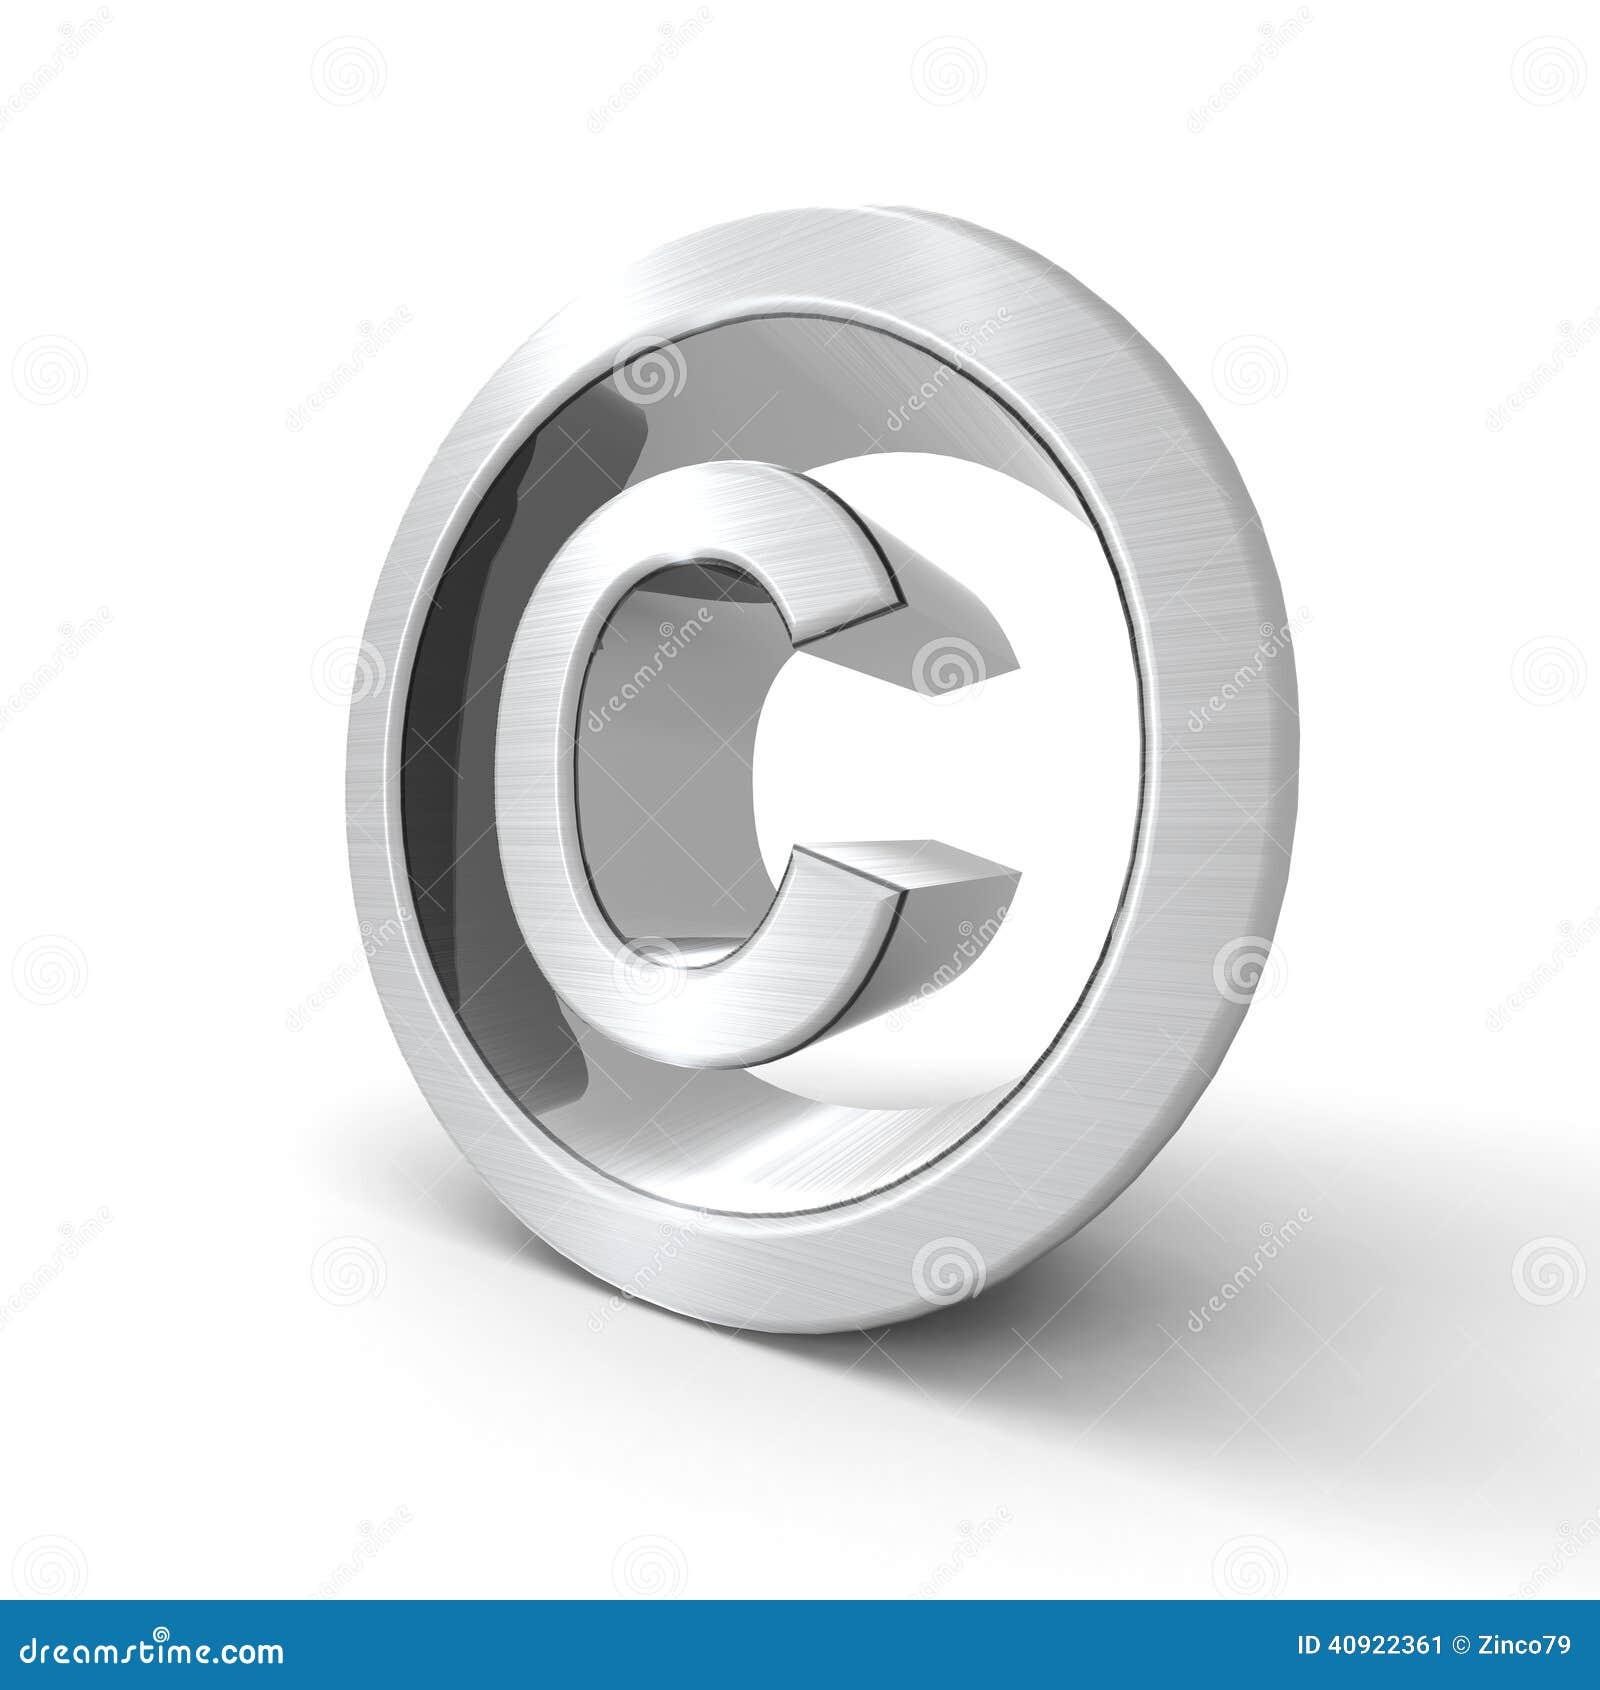 copyright symbol royaltyfree stock image cartoondealer